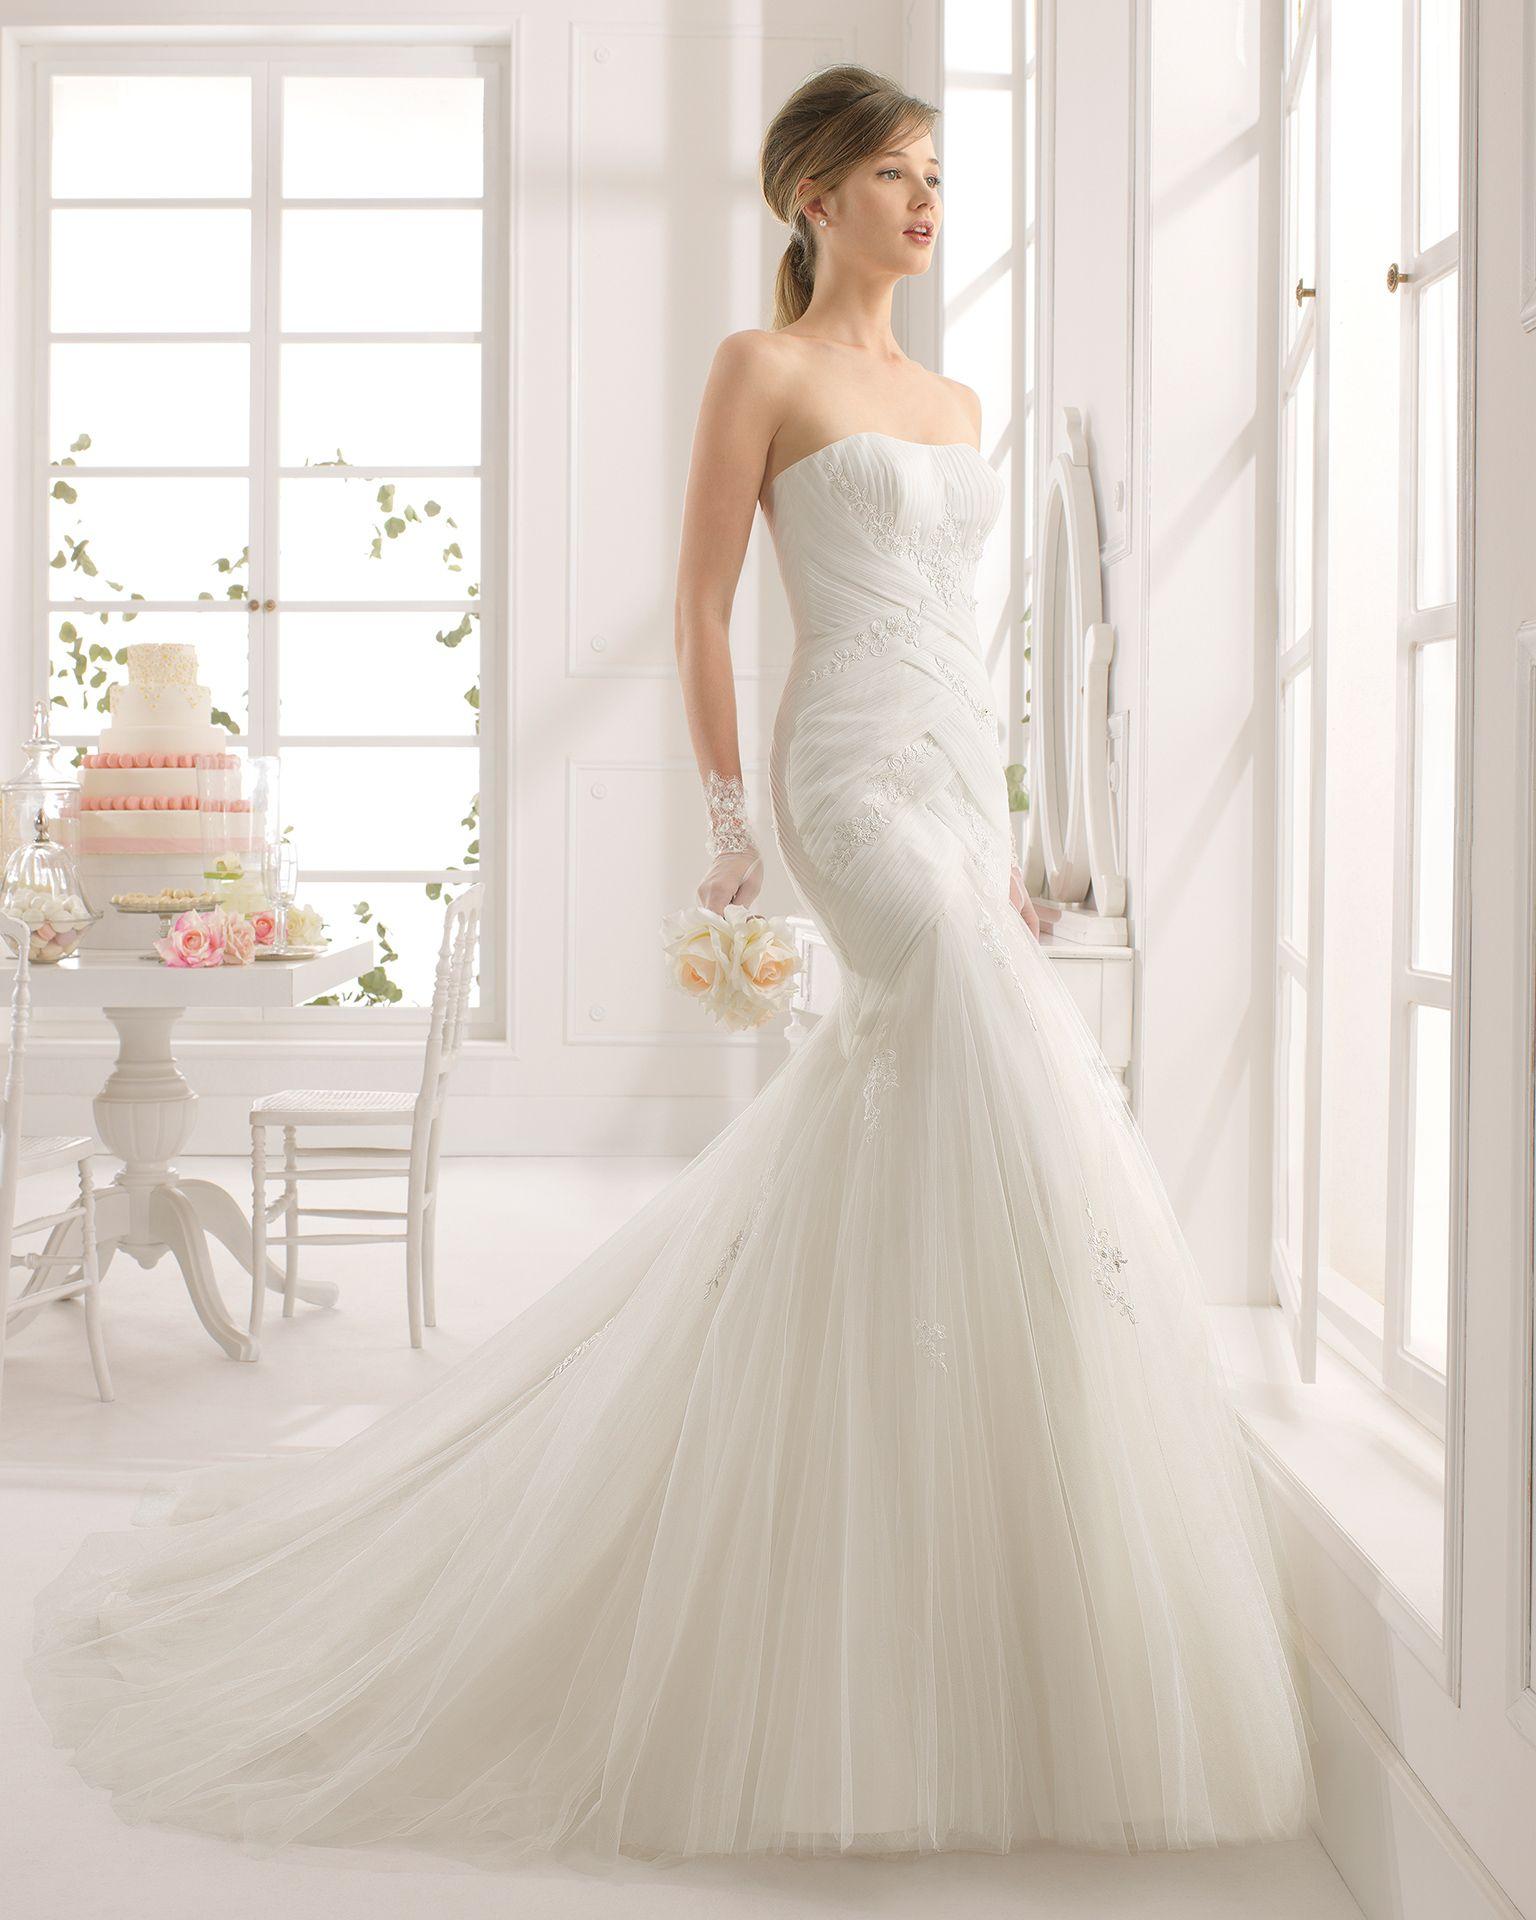 Alejandra vestido de novia corte sirena | Wedding Dress | Pinterest ...